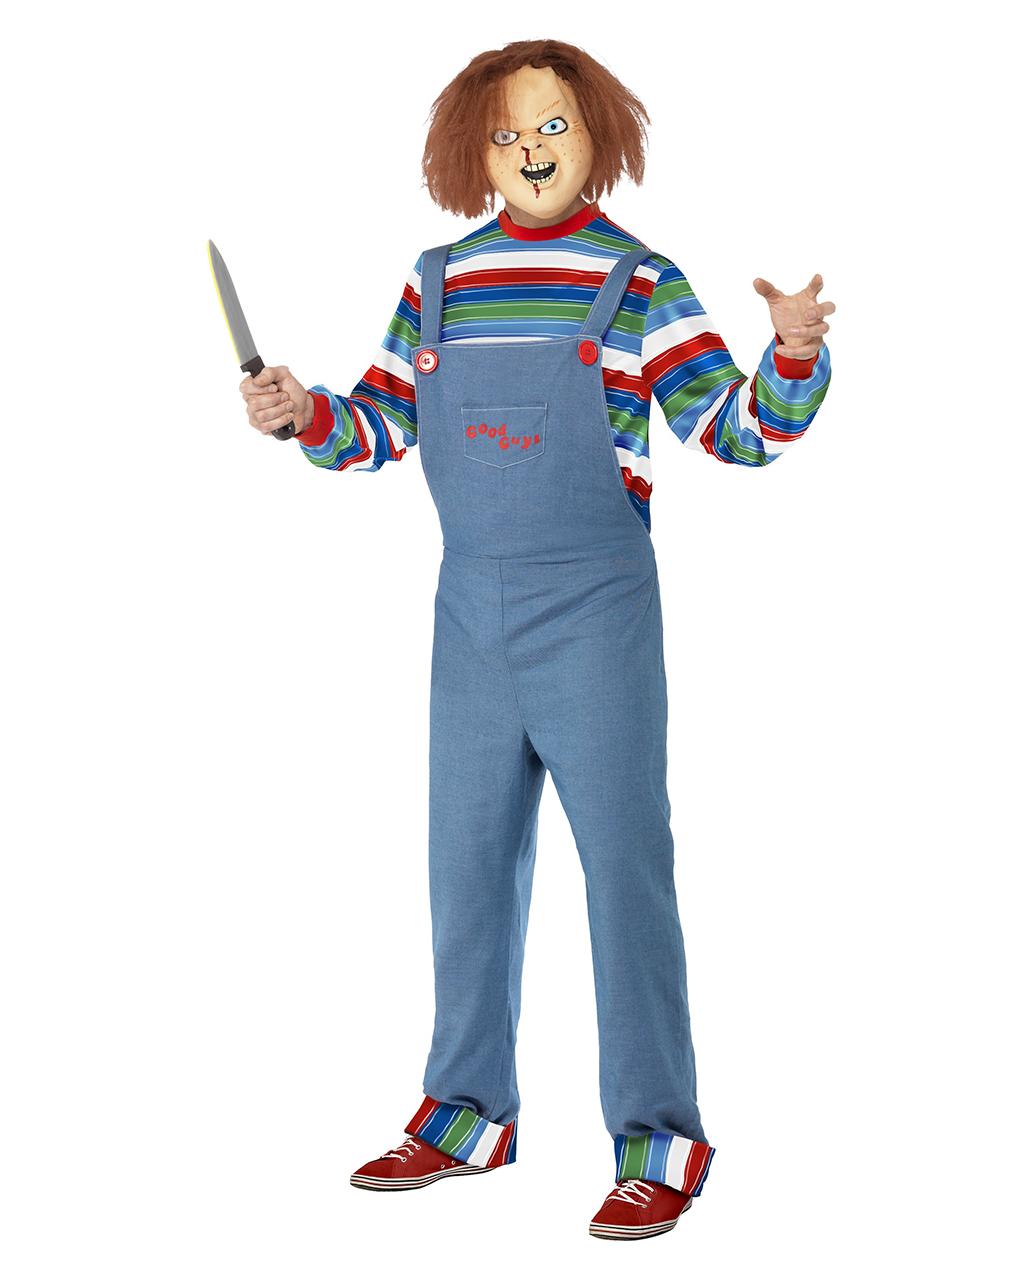 Kids Chucky WIG Evil Killer Doll Child/'s Play Halloween Horror Movie Fancy Dress